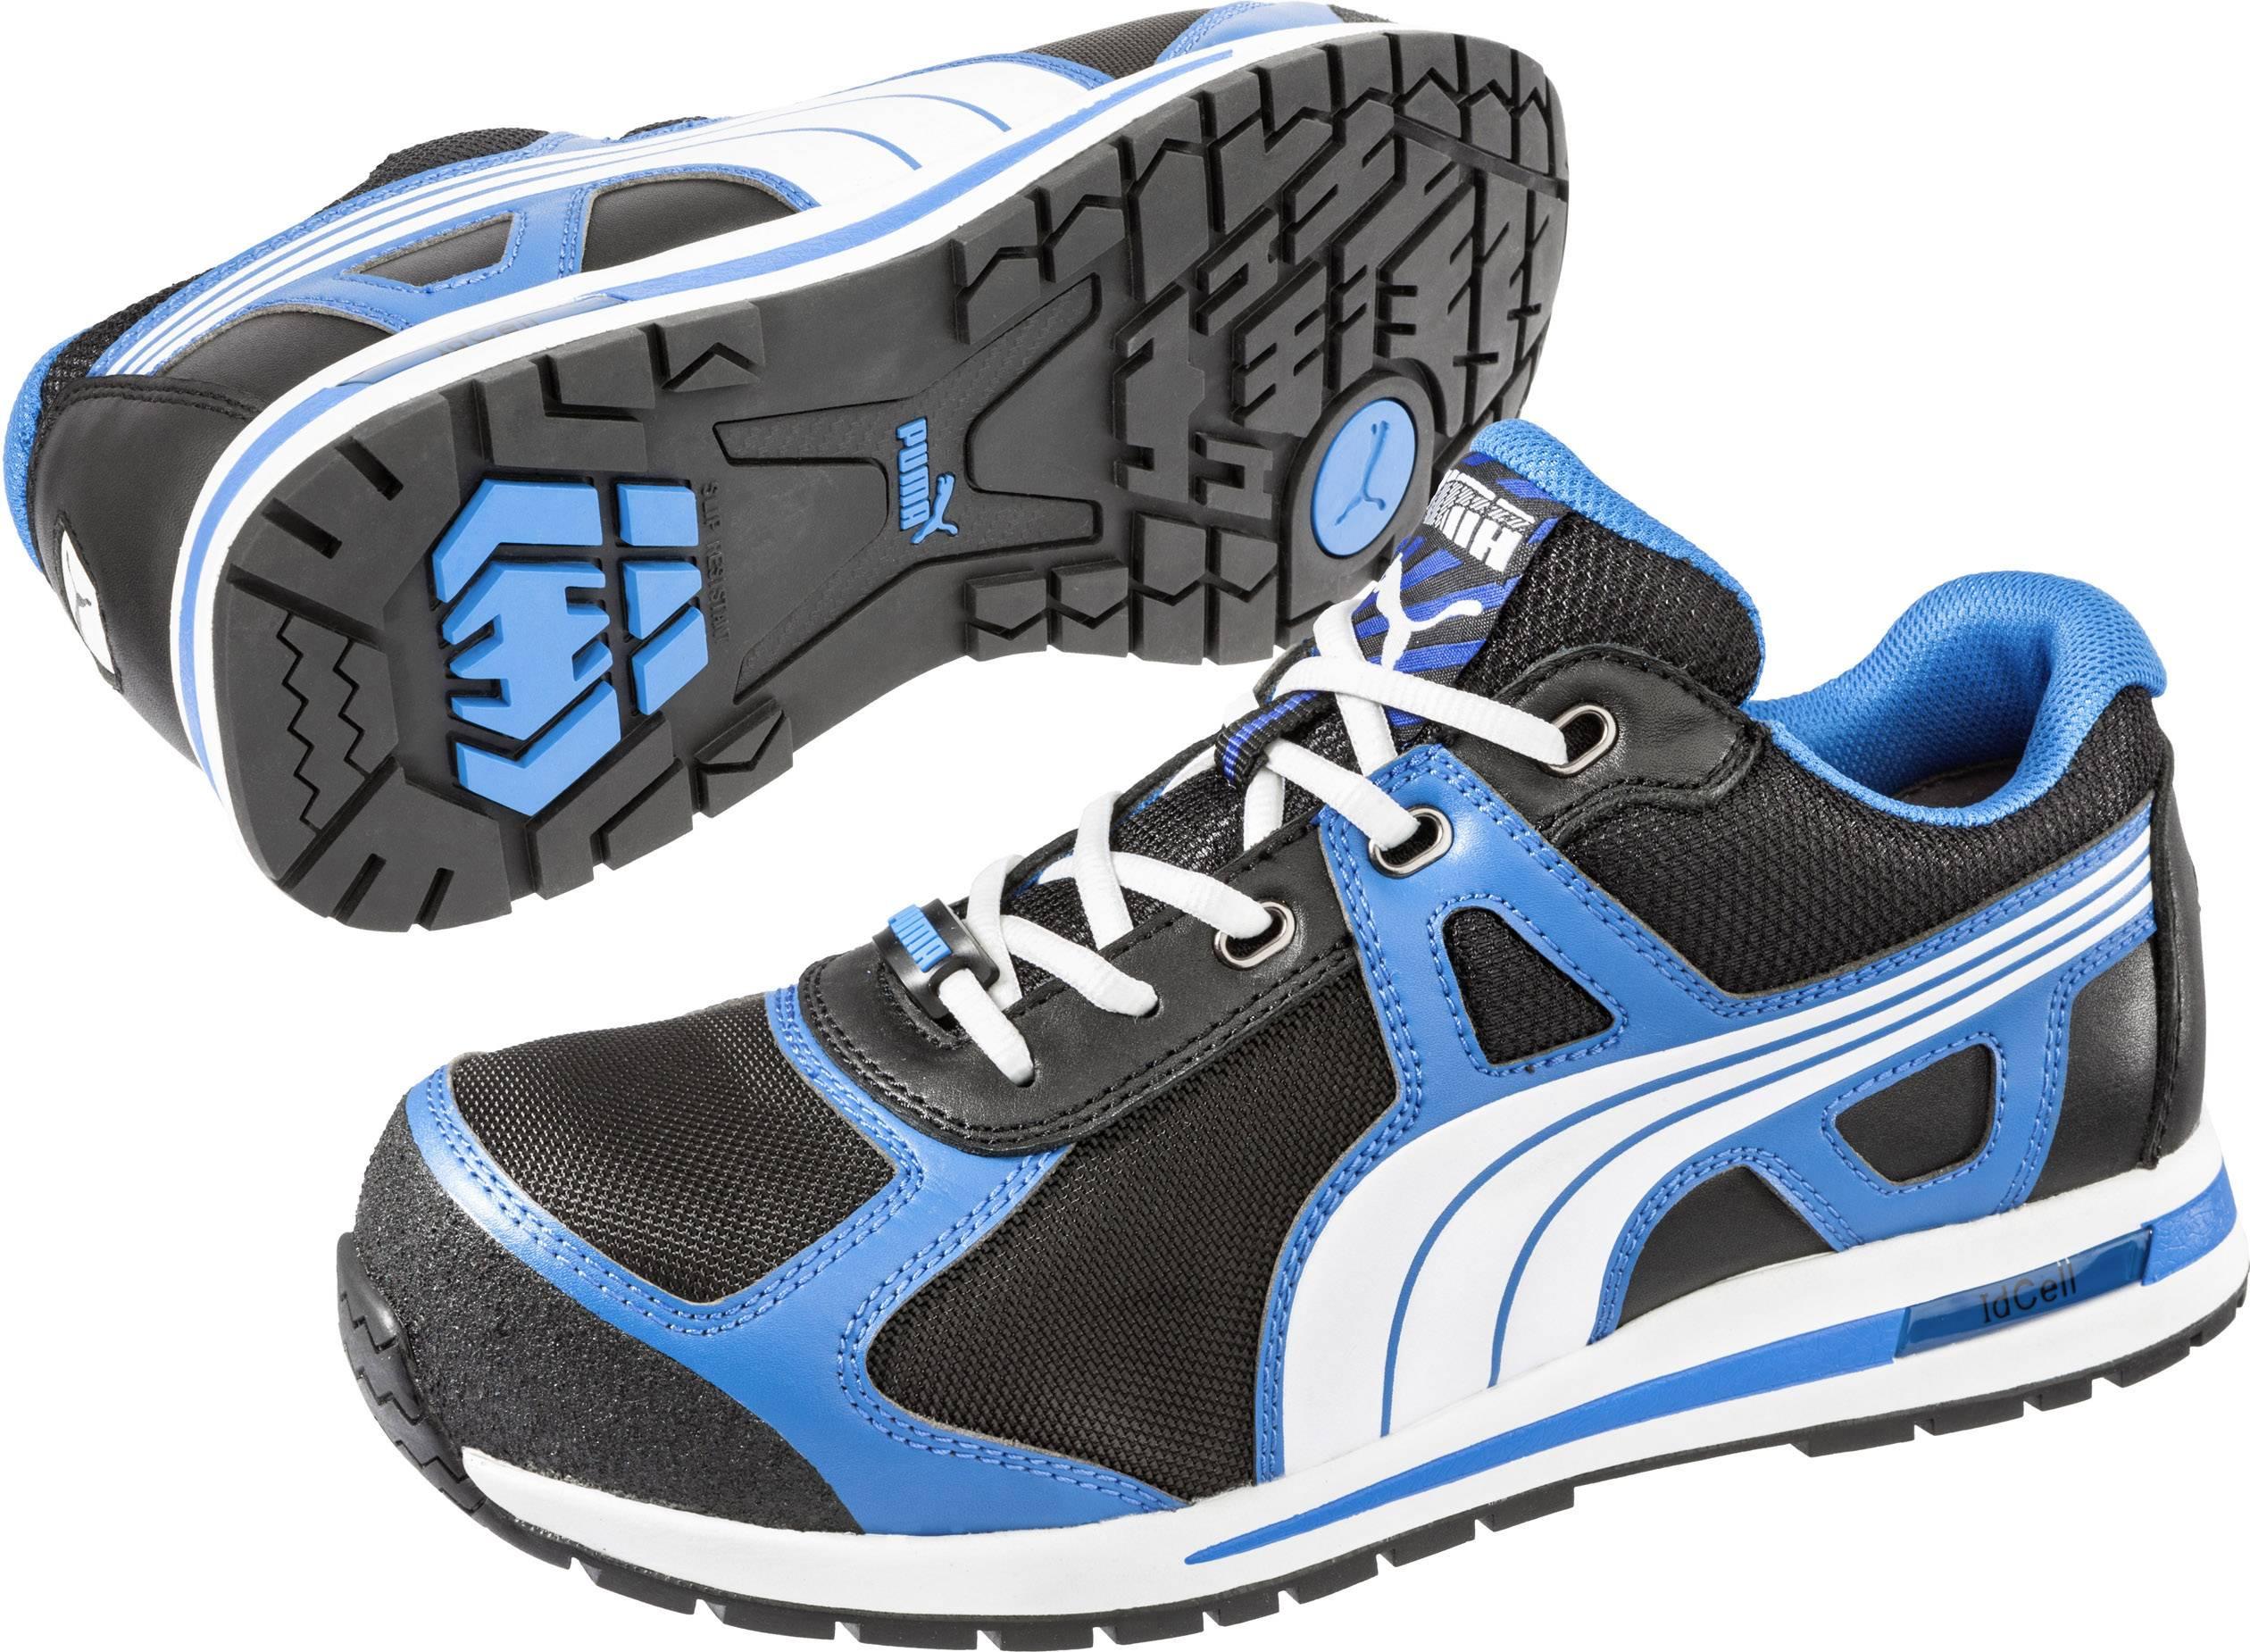 Bezpečnostní obuv S1P PUMA Safety Aerial Low HRO SRC 643020-44, vel.: 44, černá, modrá, bílá, 1 pár